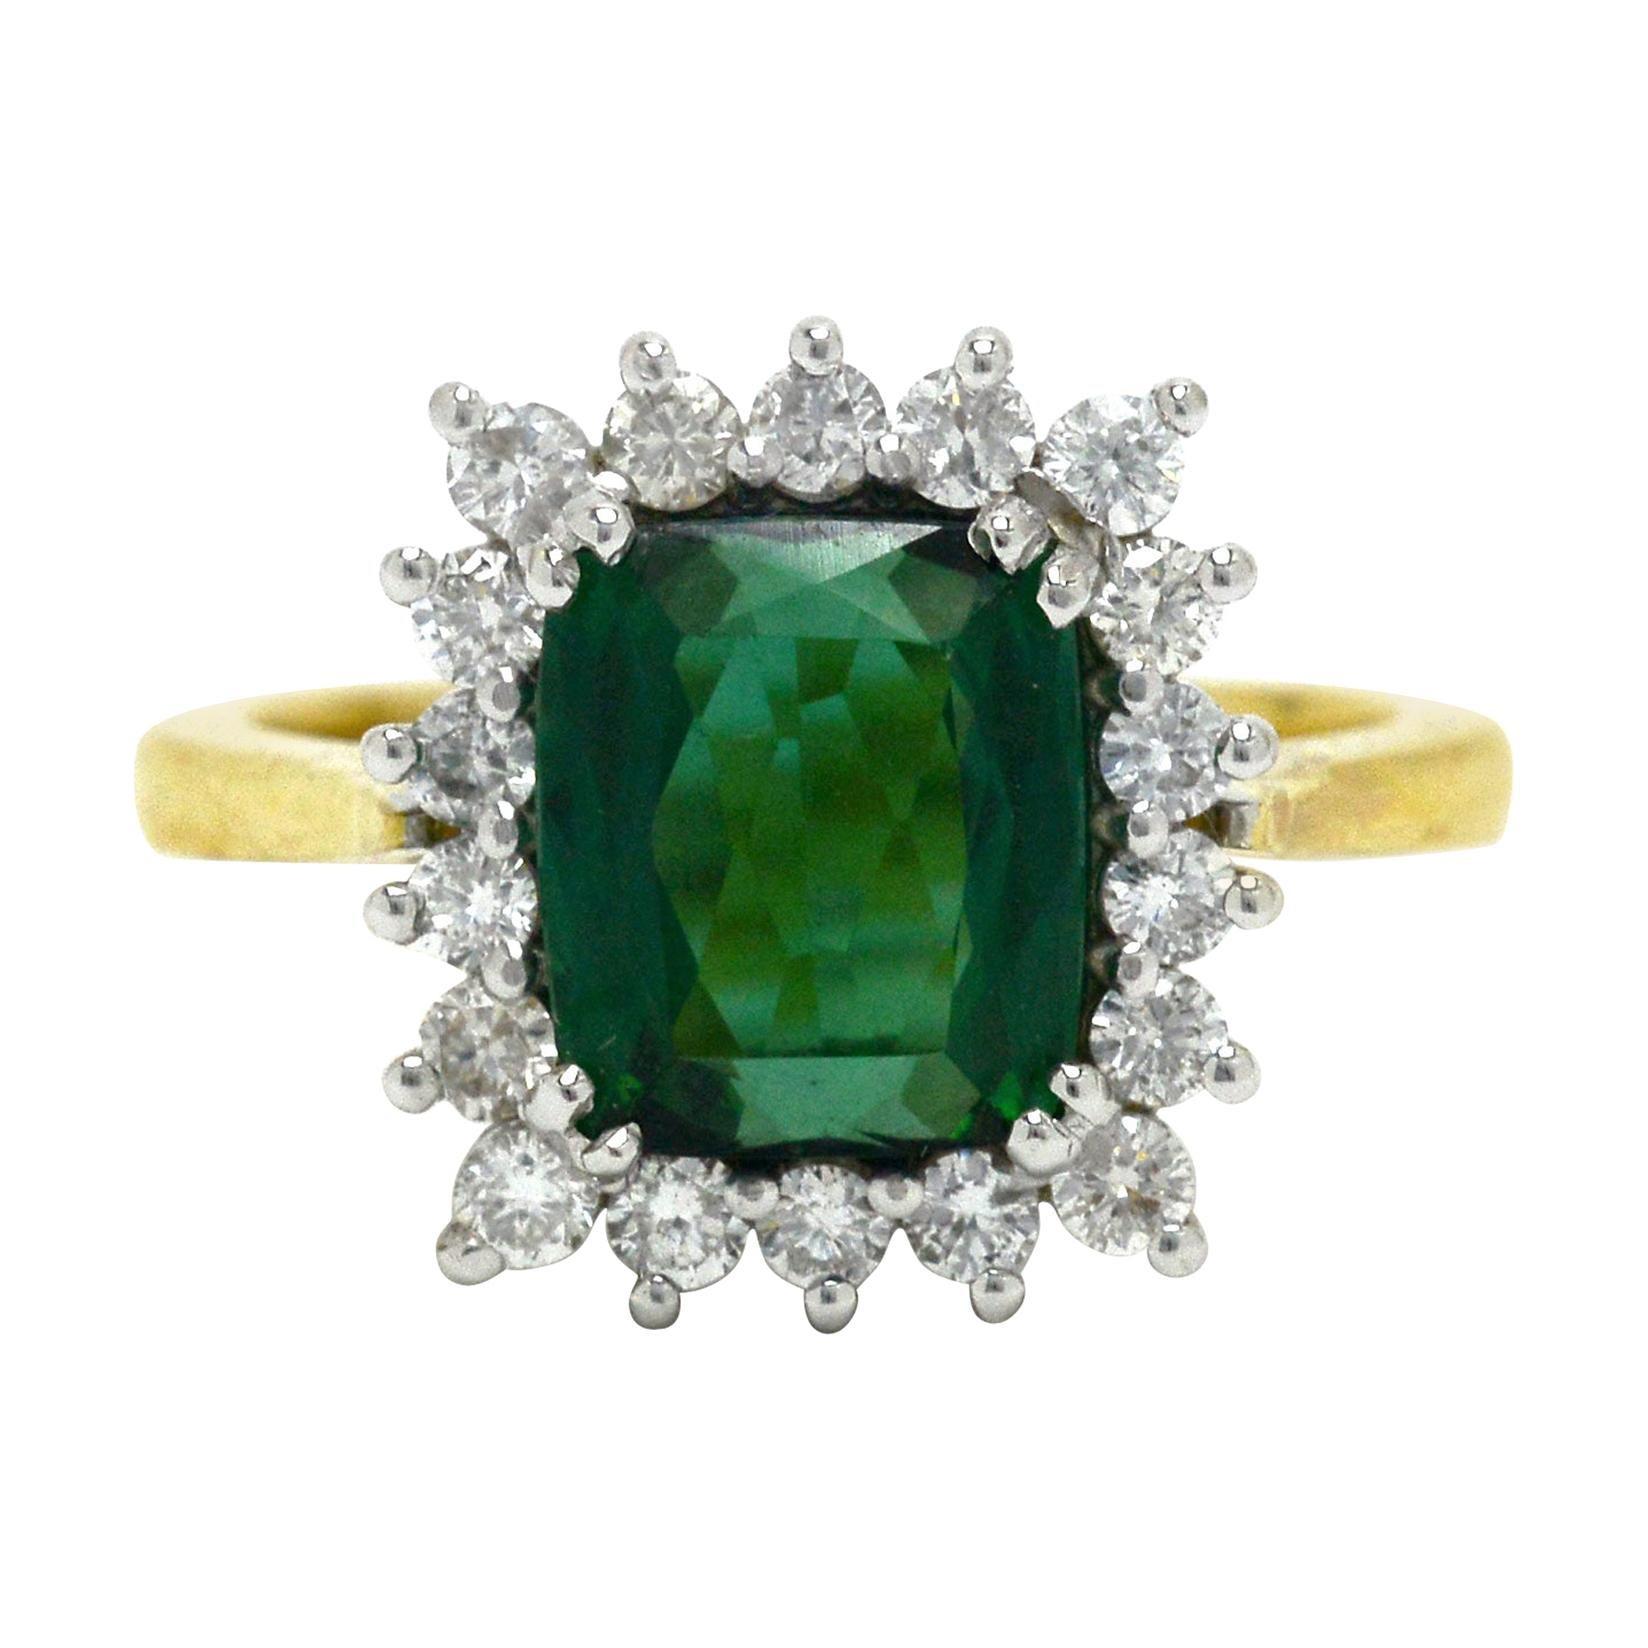 Vivid Green Tourmaline Engagement Ring Cocktail Gemstone 4 Carat Diamond Halo